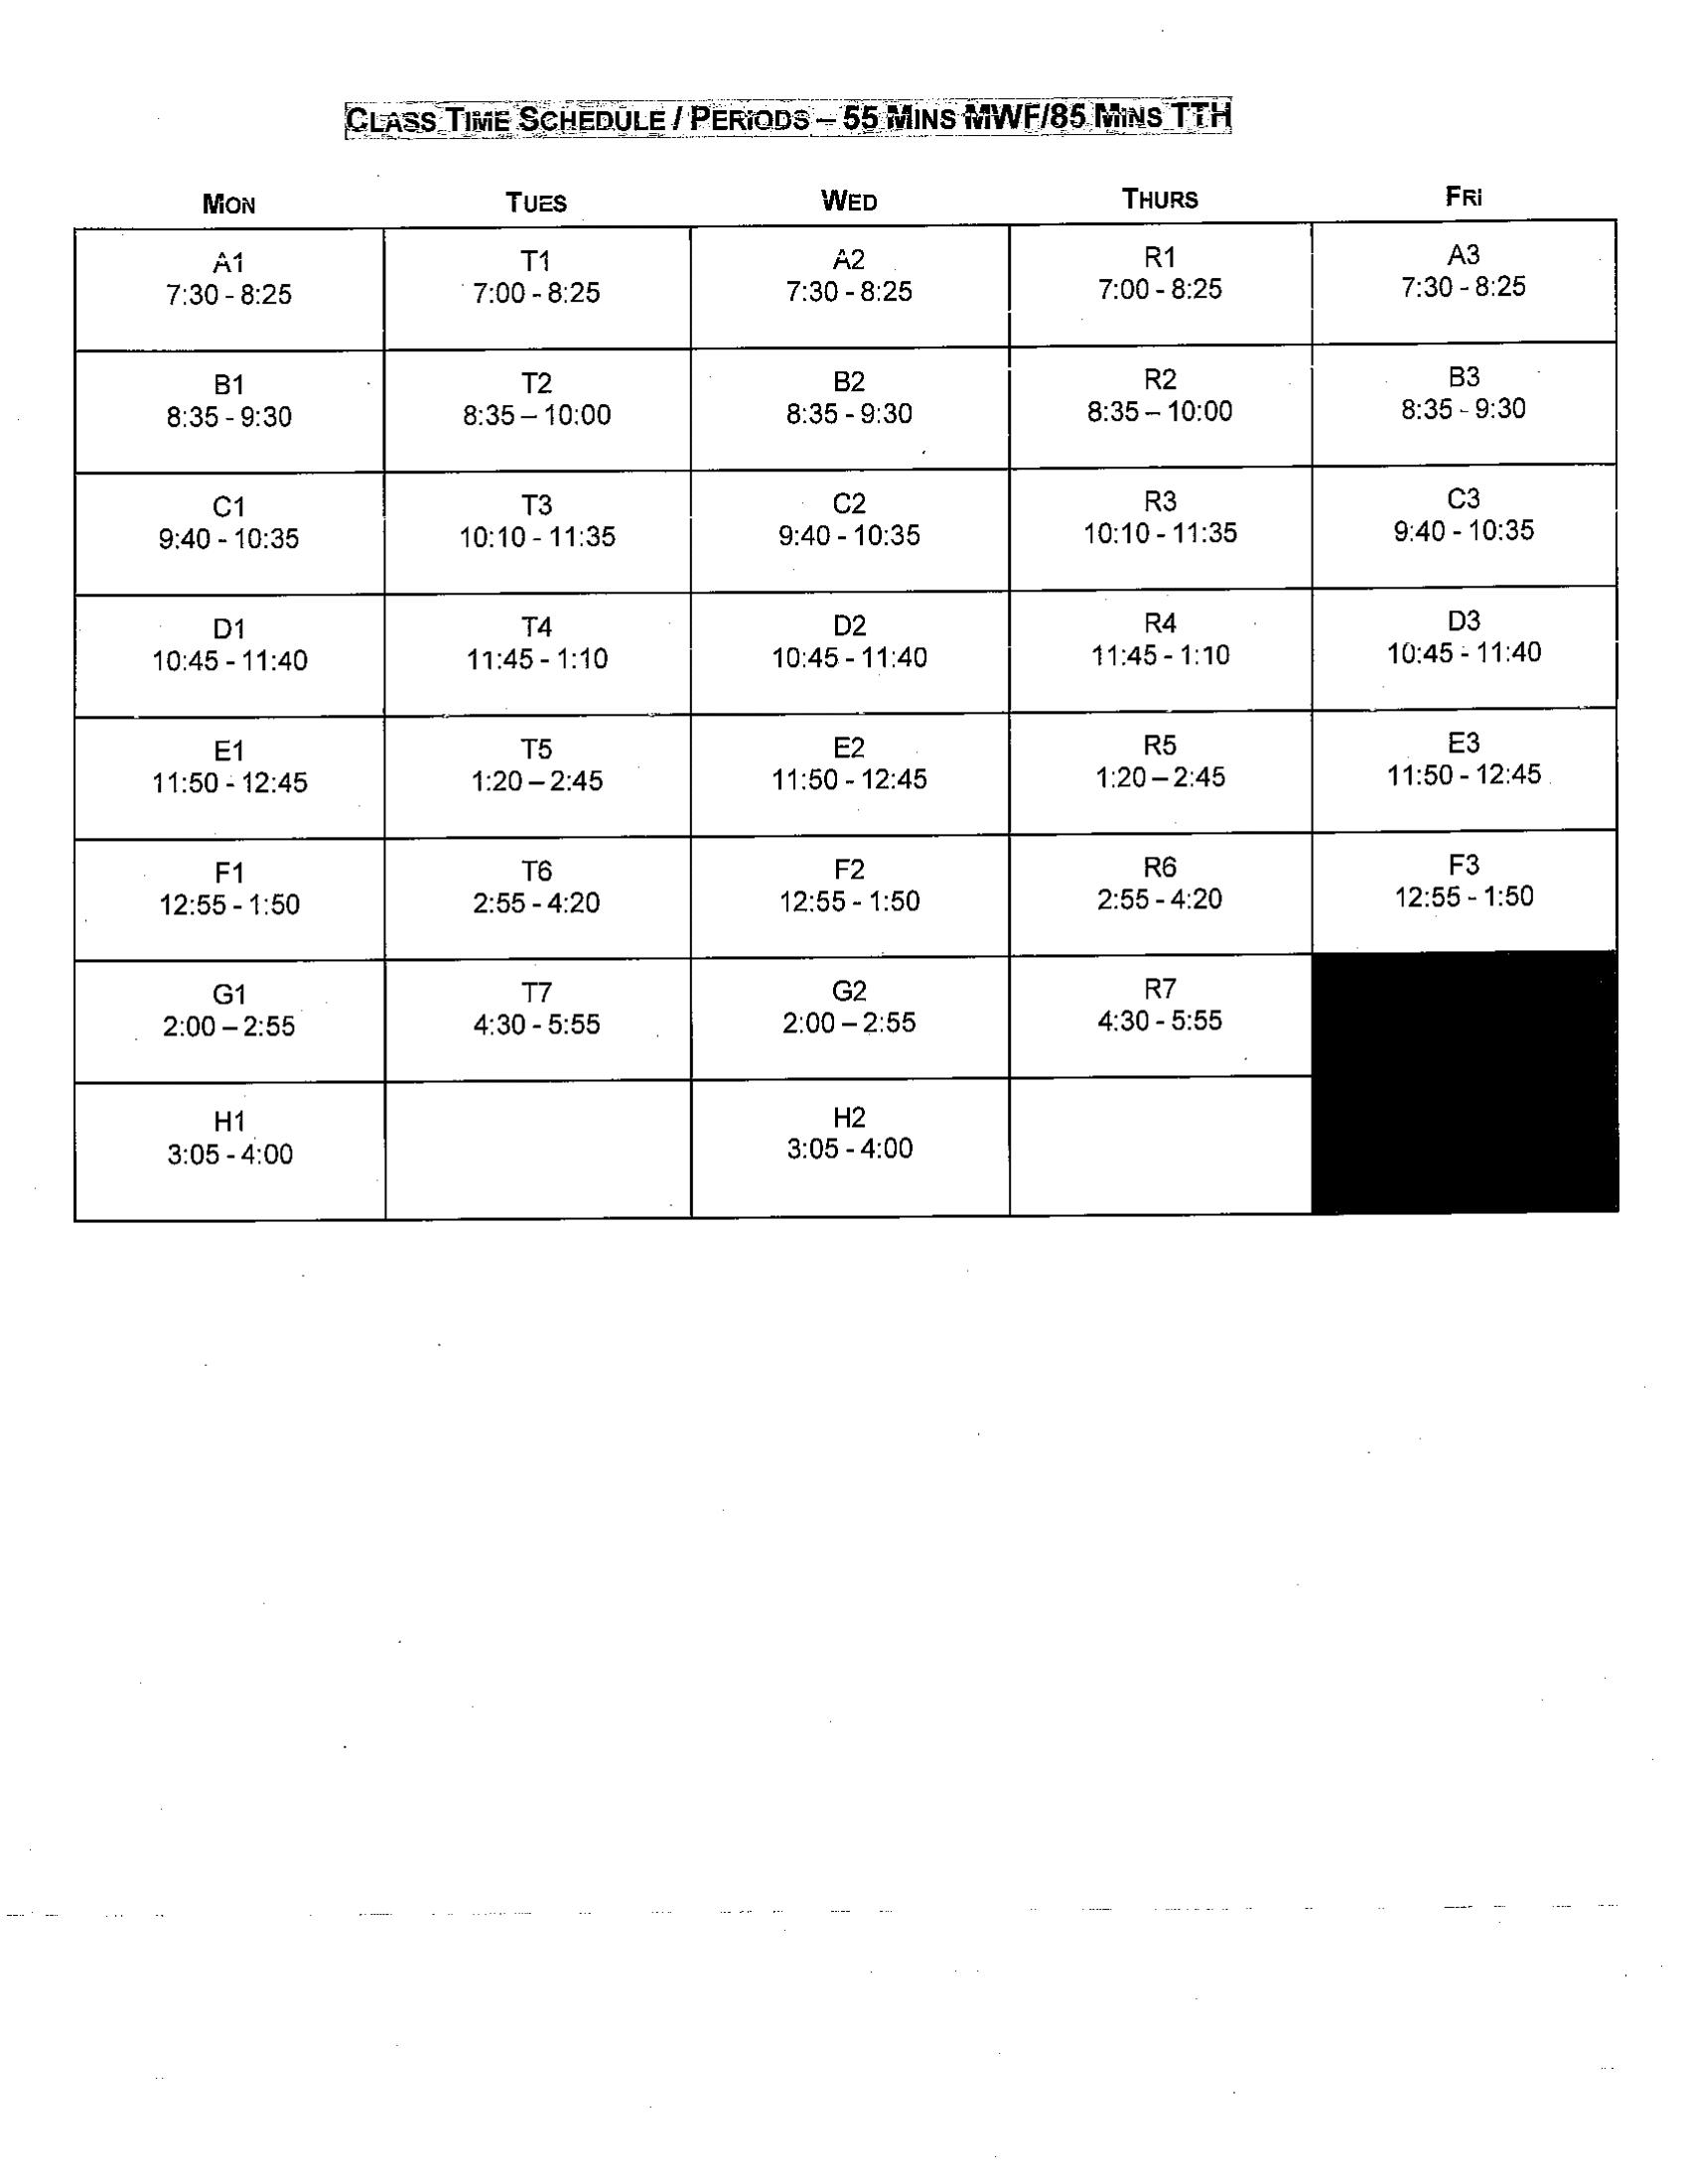 JCJC Class Search